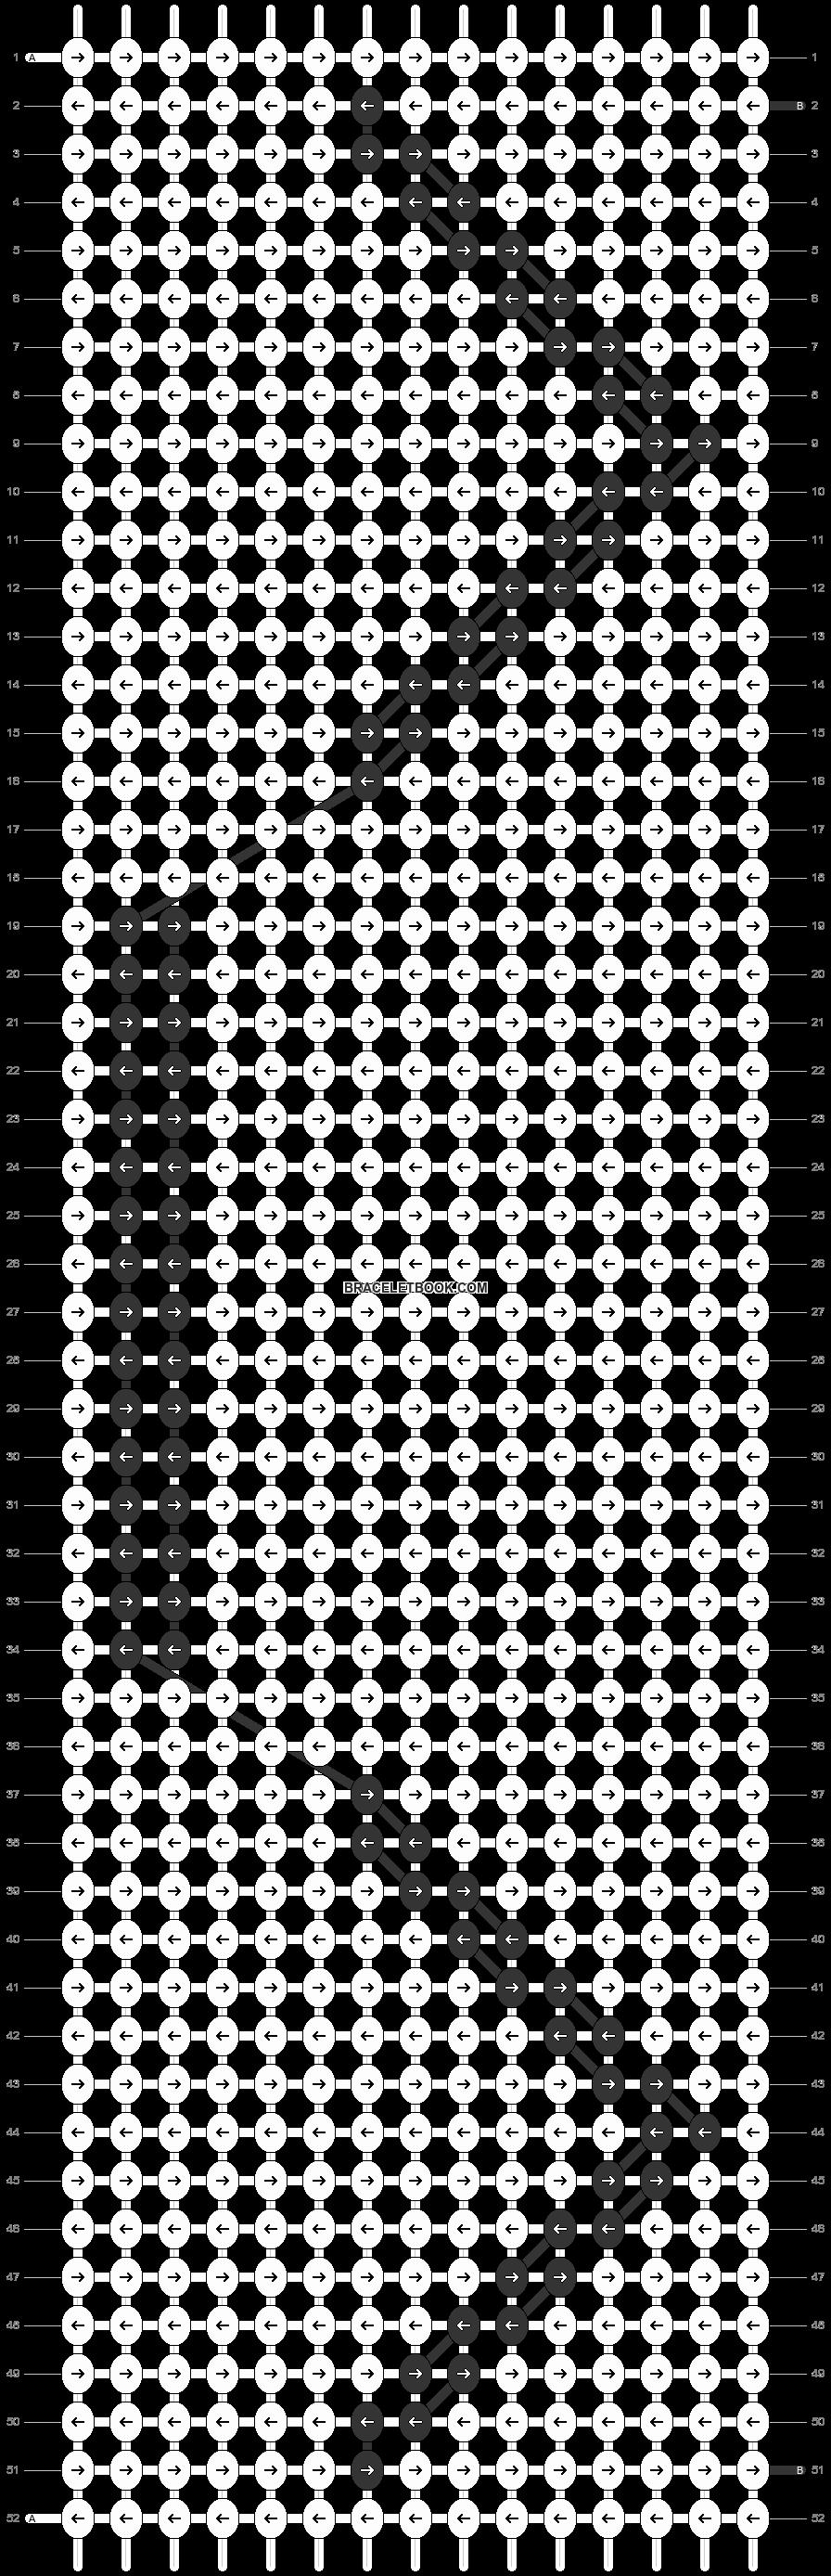 Alpha pattern #6232 pattern